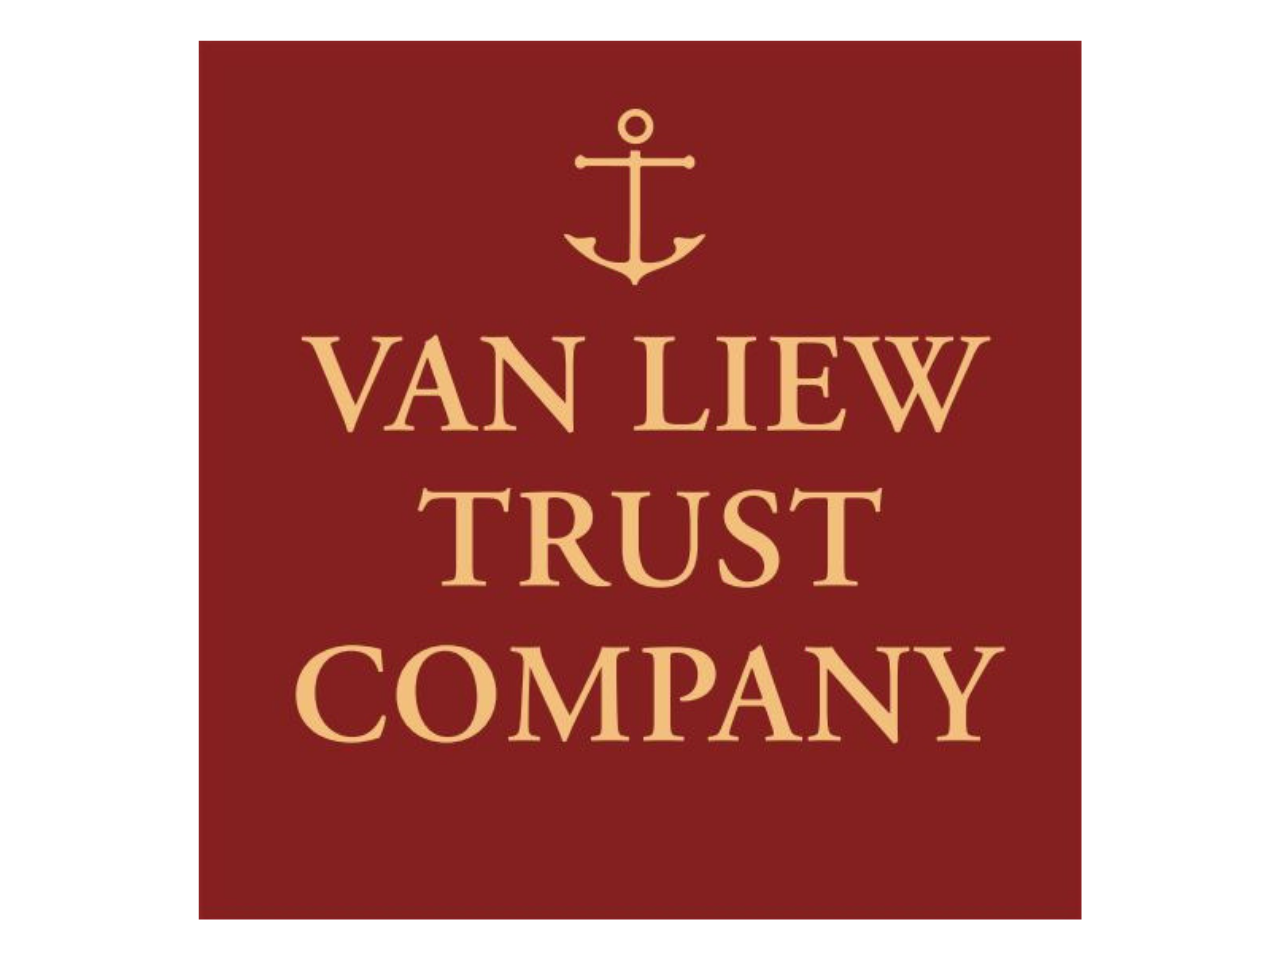 Van Liew Trust Company